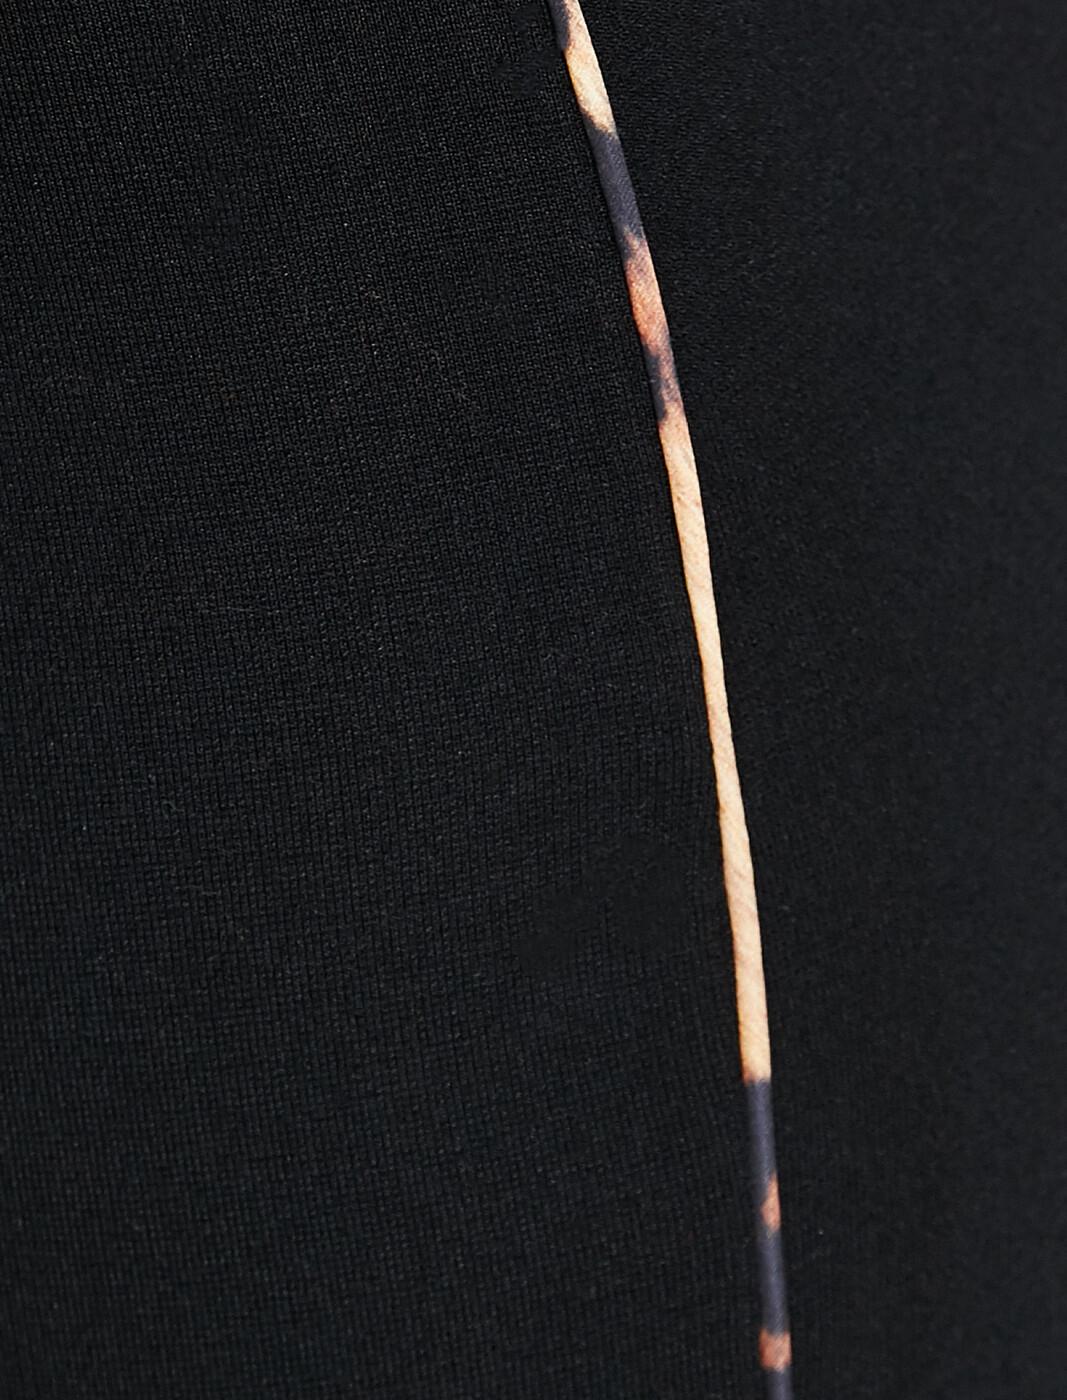 Полупьедестал Grohe Euro Ceramic, 39325000, белый mikado focus 3 серебро 00h